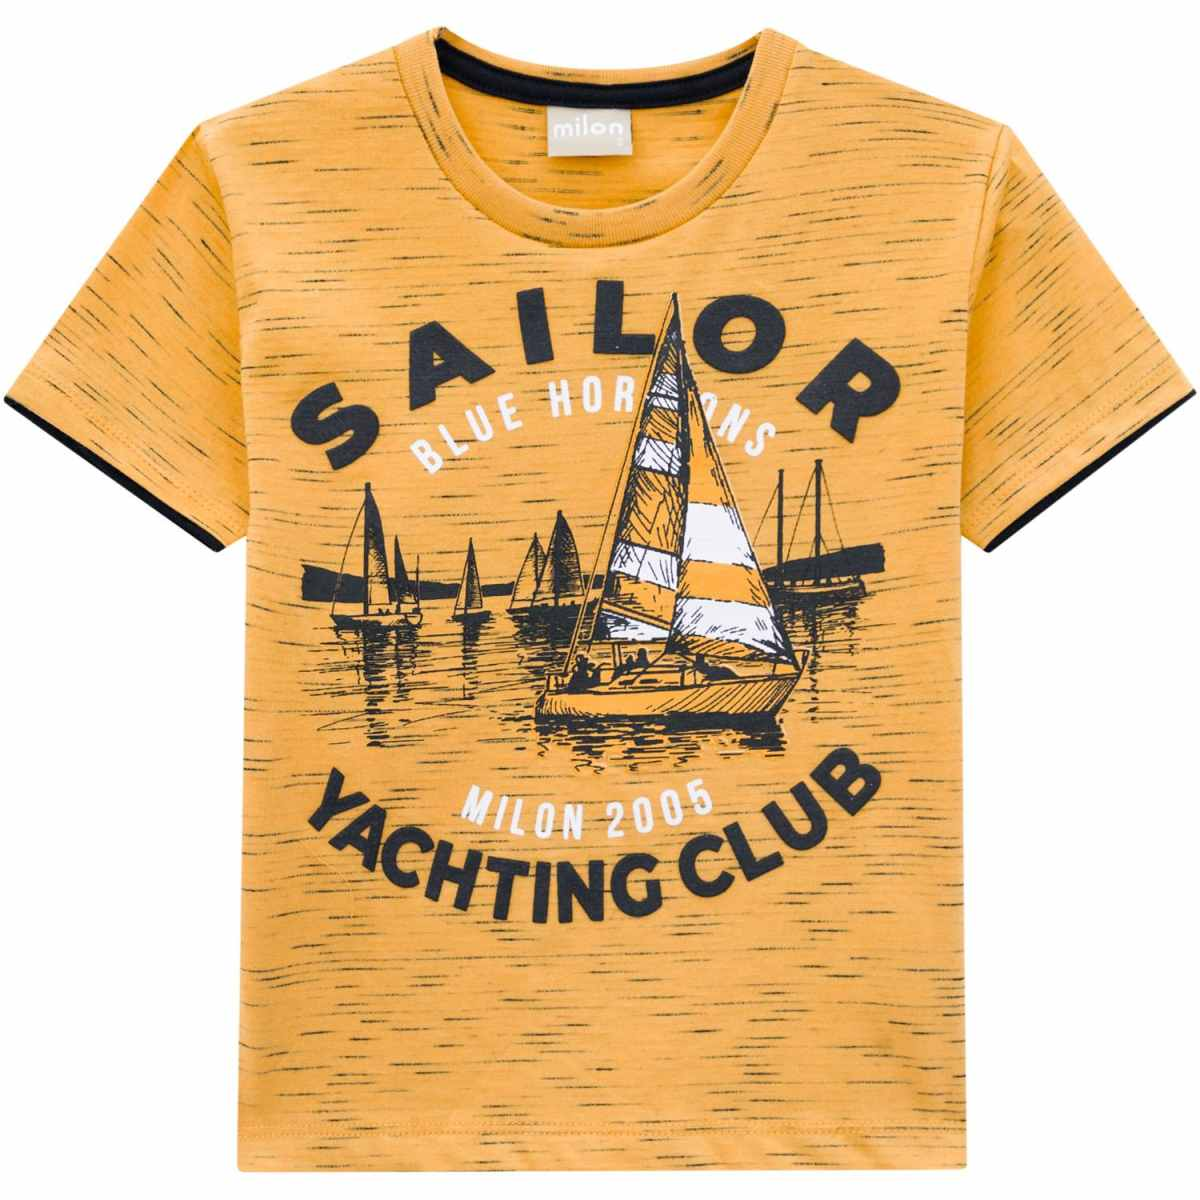 Camiseta Infantil Menino Milon - Amarelo Queimado